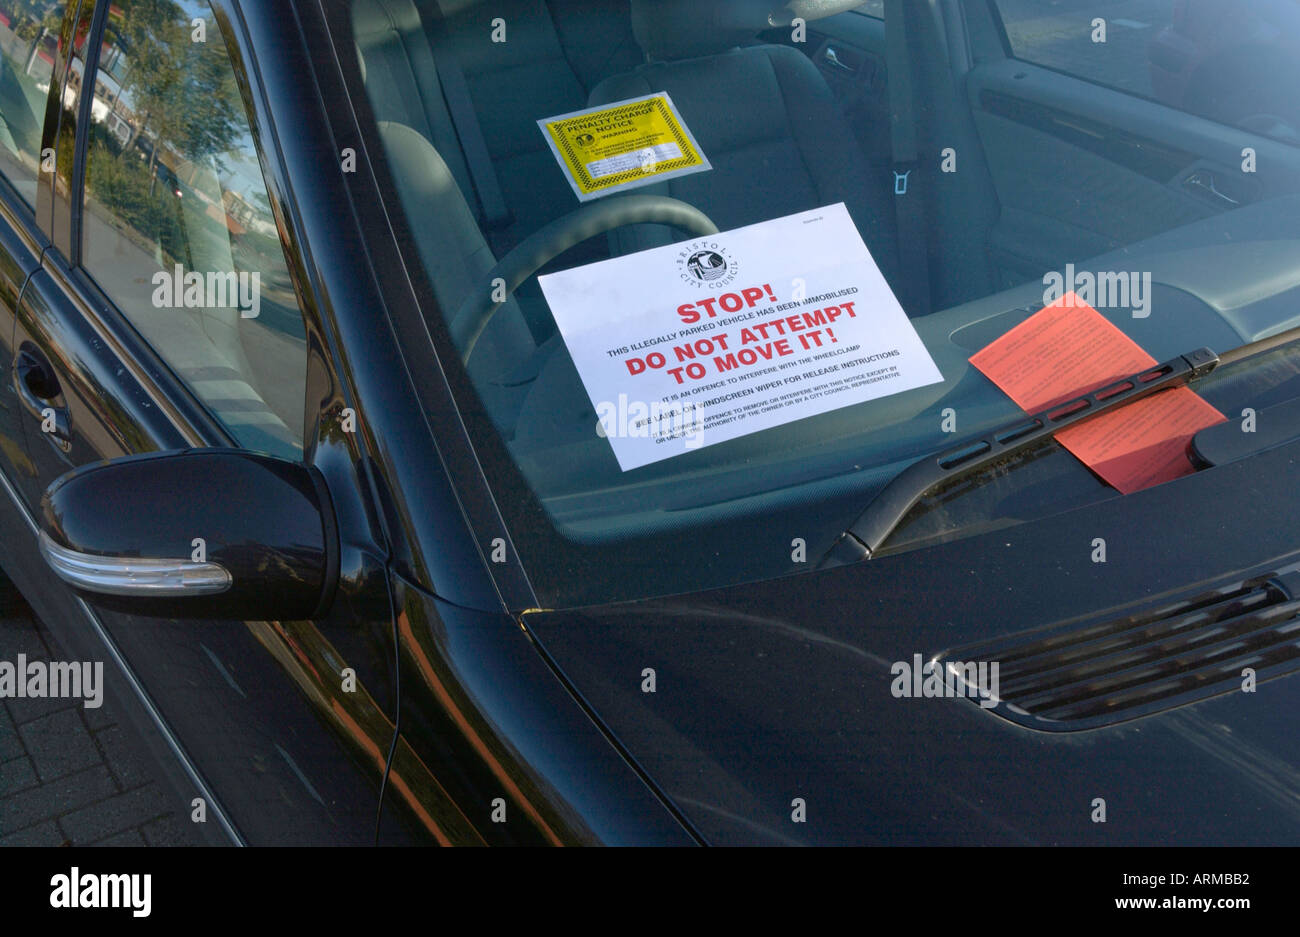 Gb Sticker Car Stock Photos  Gb Sticker Car Stock Images Alamy - Window stickers for cars uk